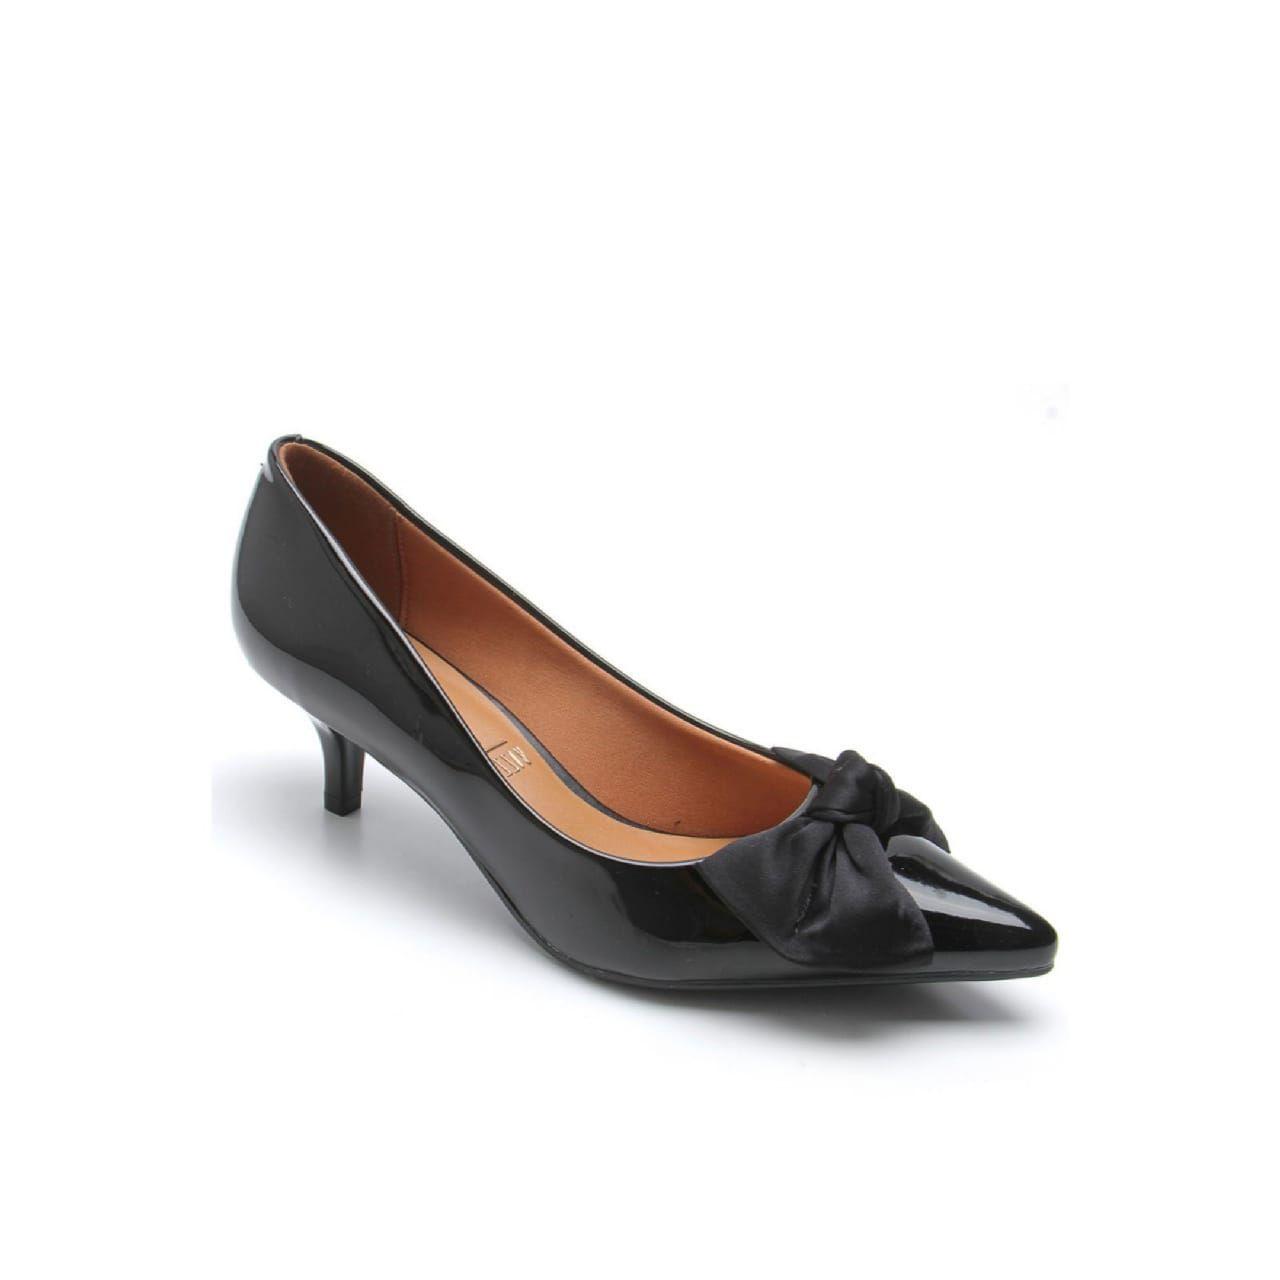 125caee0e Sapato Feminino Vizzano - BRACIA SHOP  Loja de Roupas